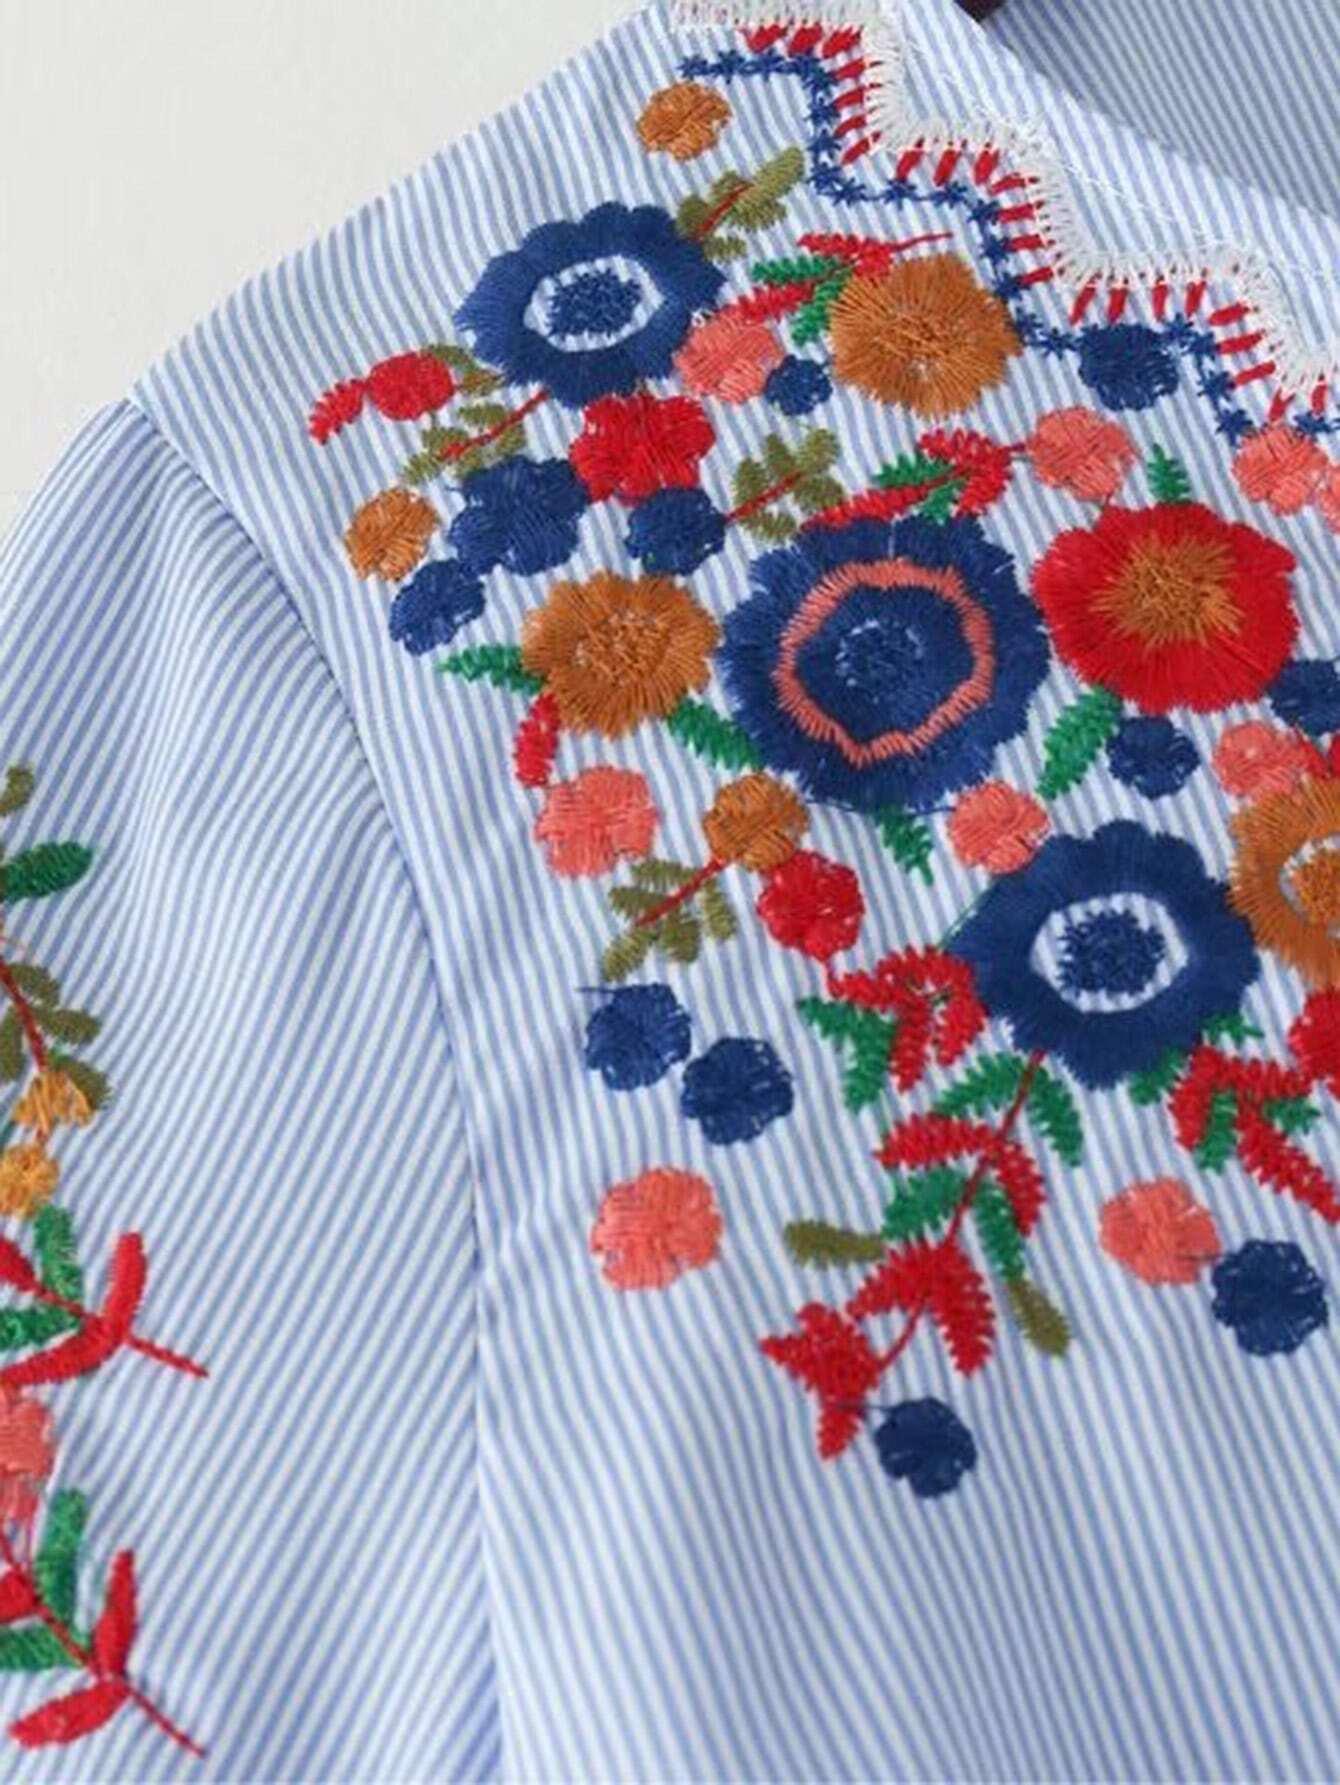 blouse170504206_2